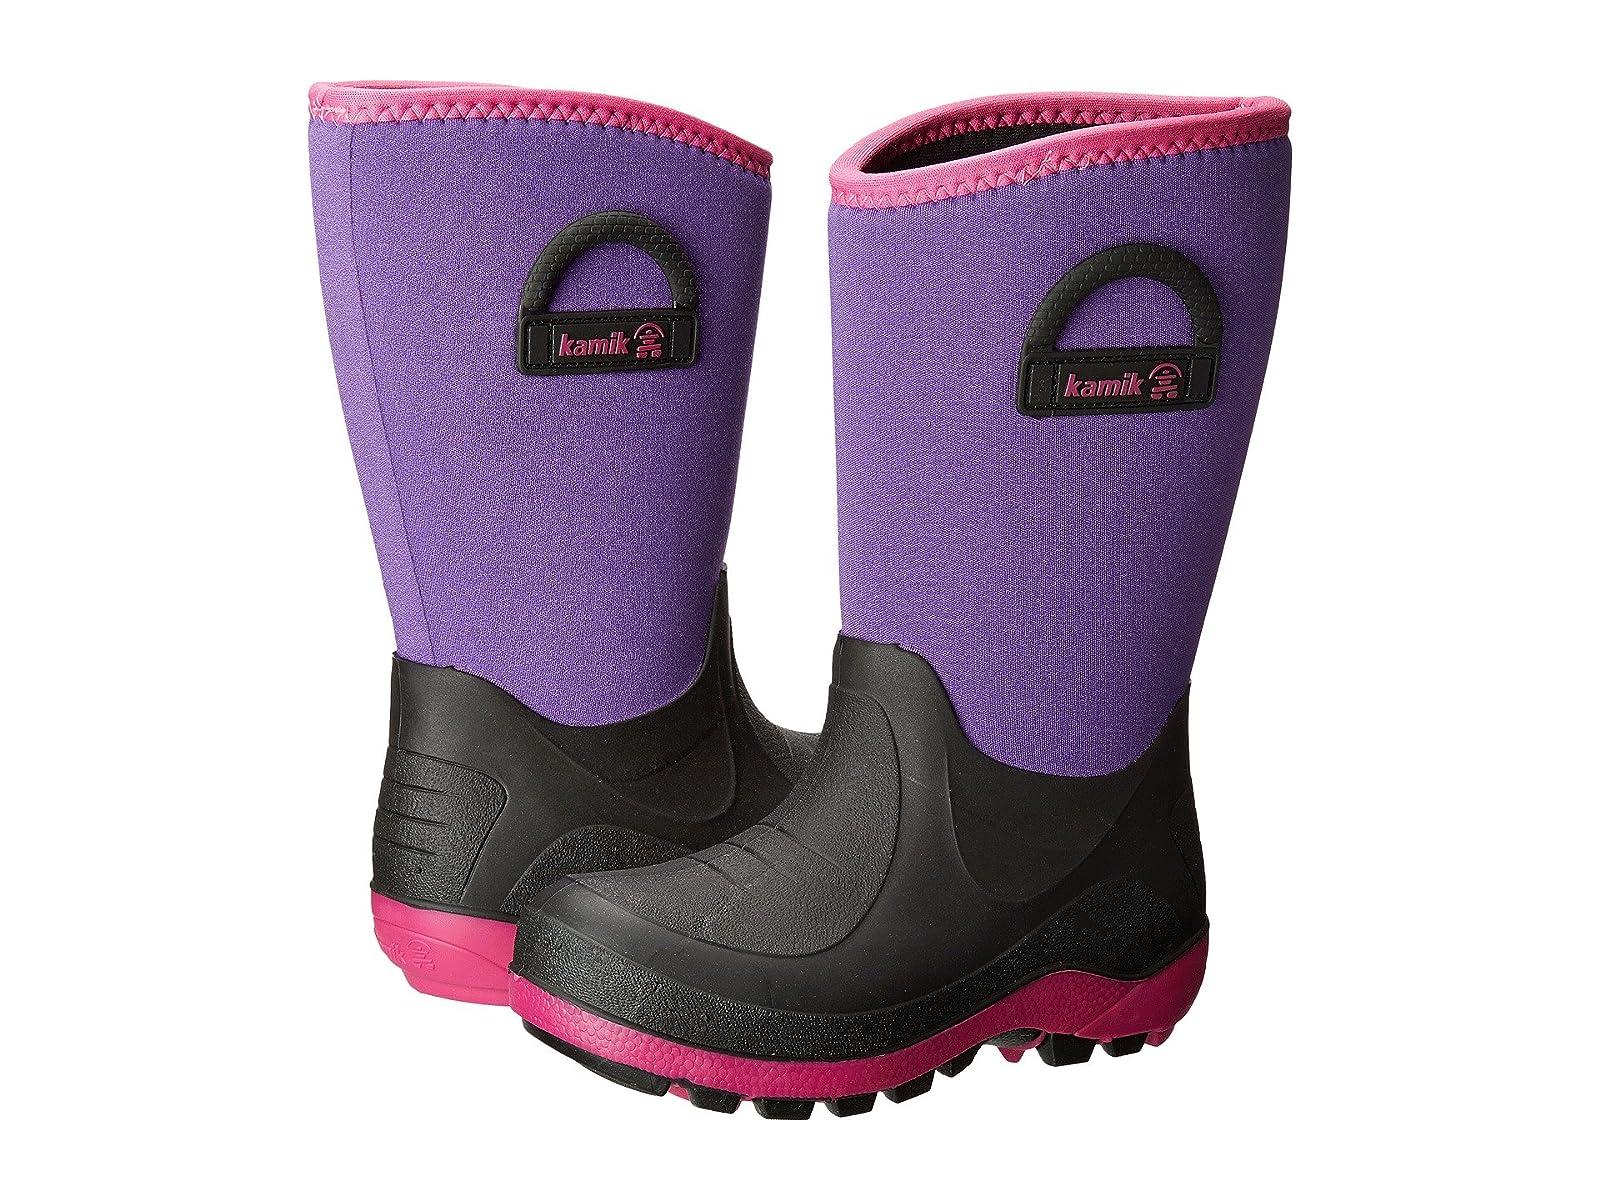 Kamik Kids Bluster (Little Kid/Big Kid)Cheap and distinctive eye-catching shoes